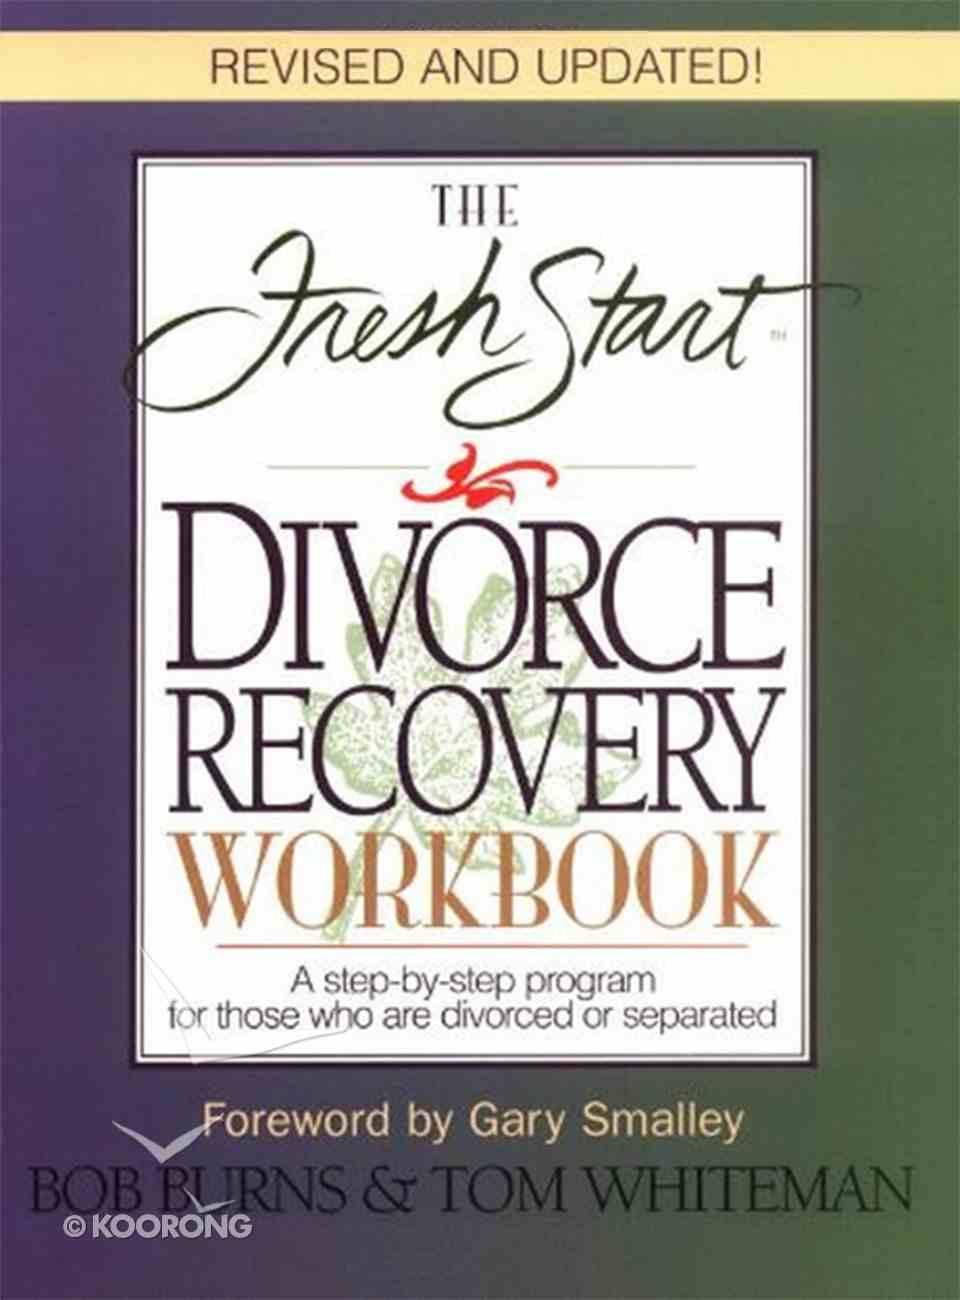 The Fresh Start Divorce Recovery Workbook eBook